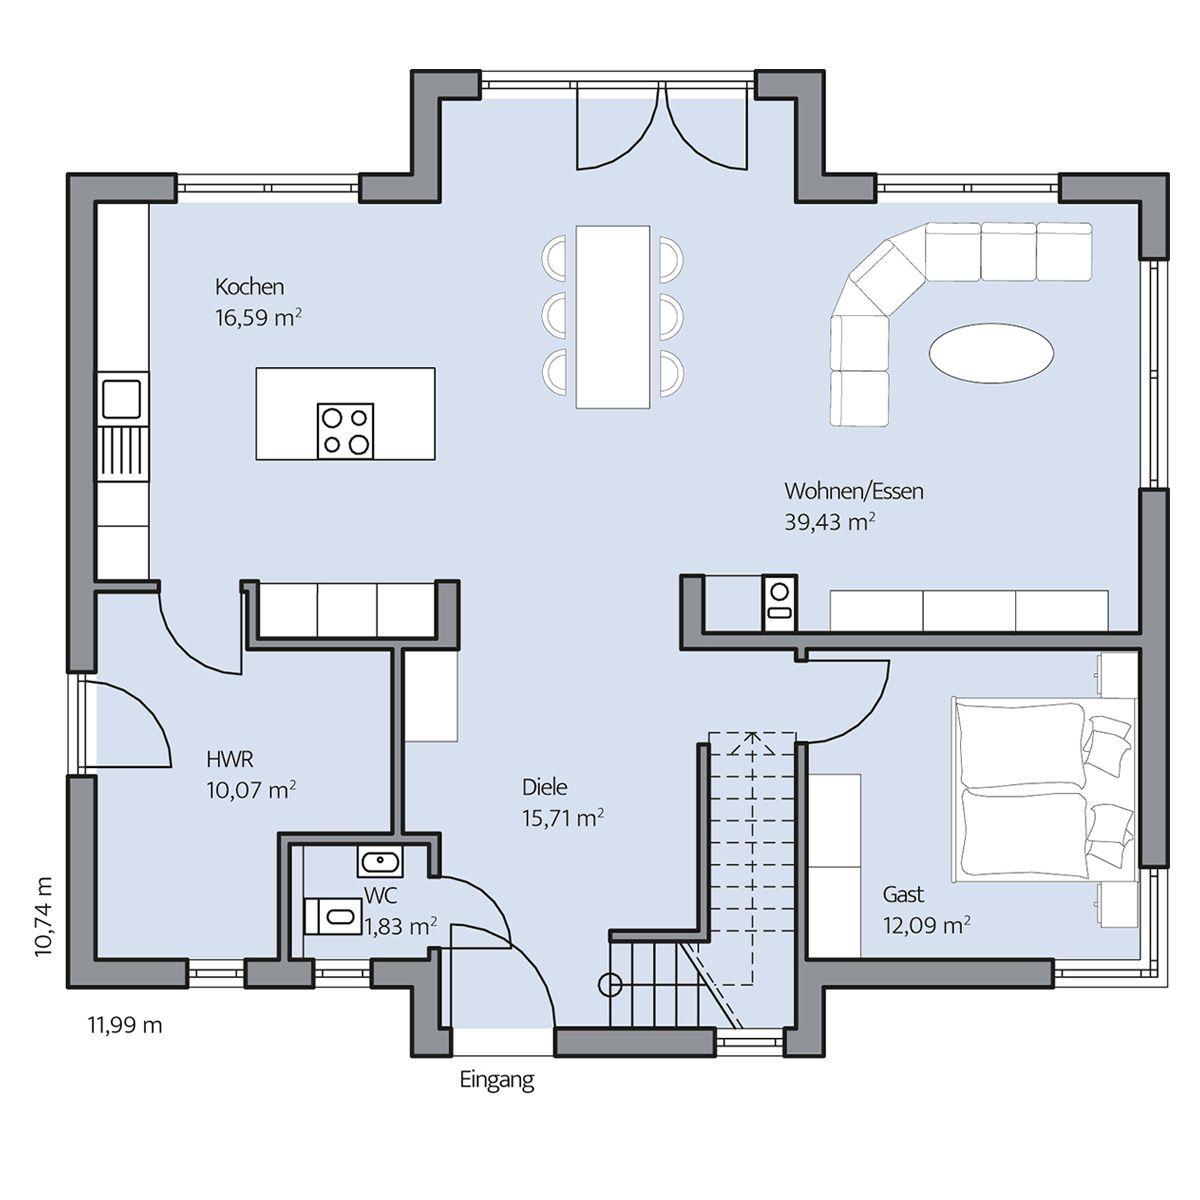 Haus Arnold Erdgeschoss Floor Plan Pinterest Haus